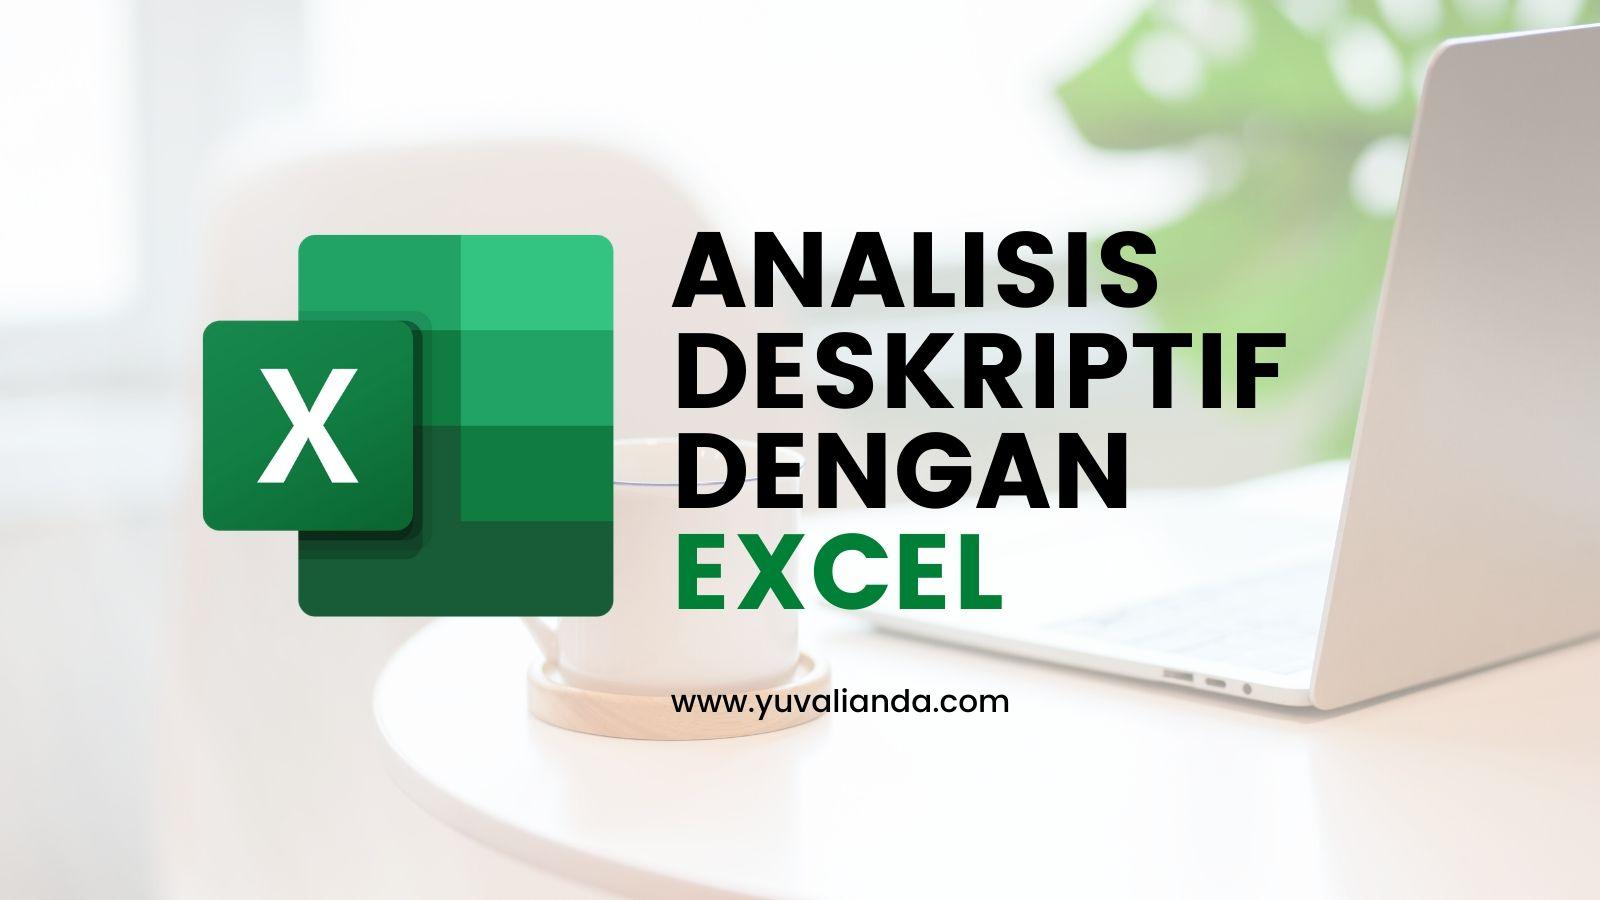 analisis-deskriptif-dengan-excel